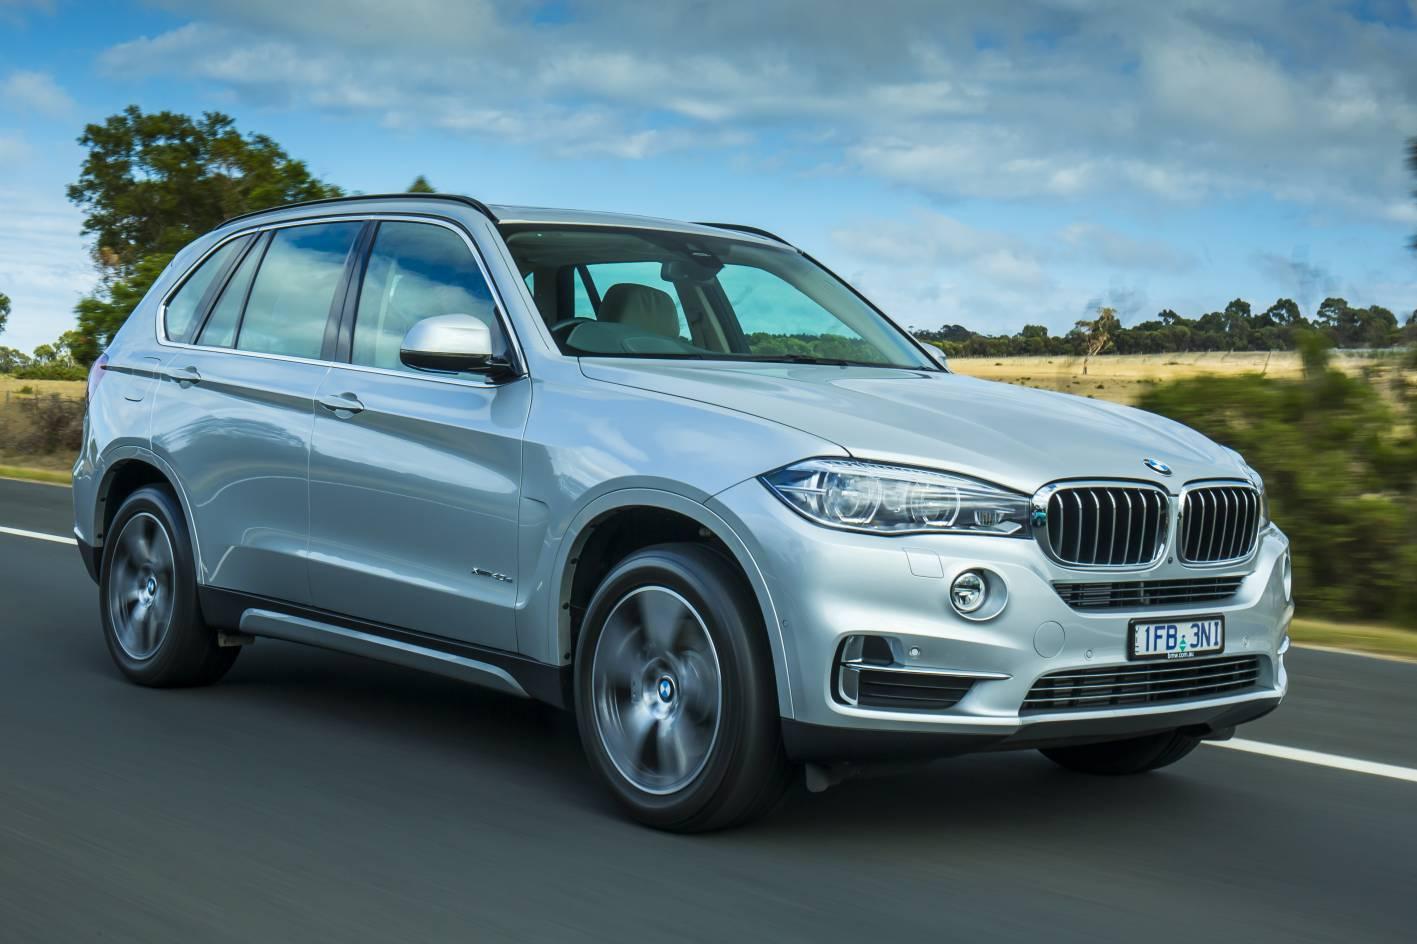 BMW X5 - better dynamics